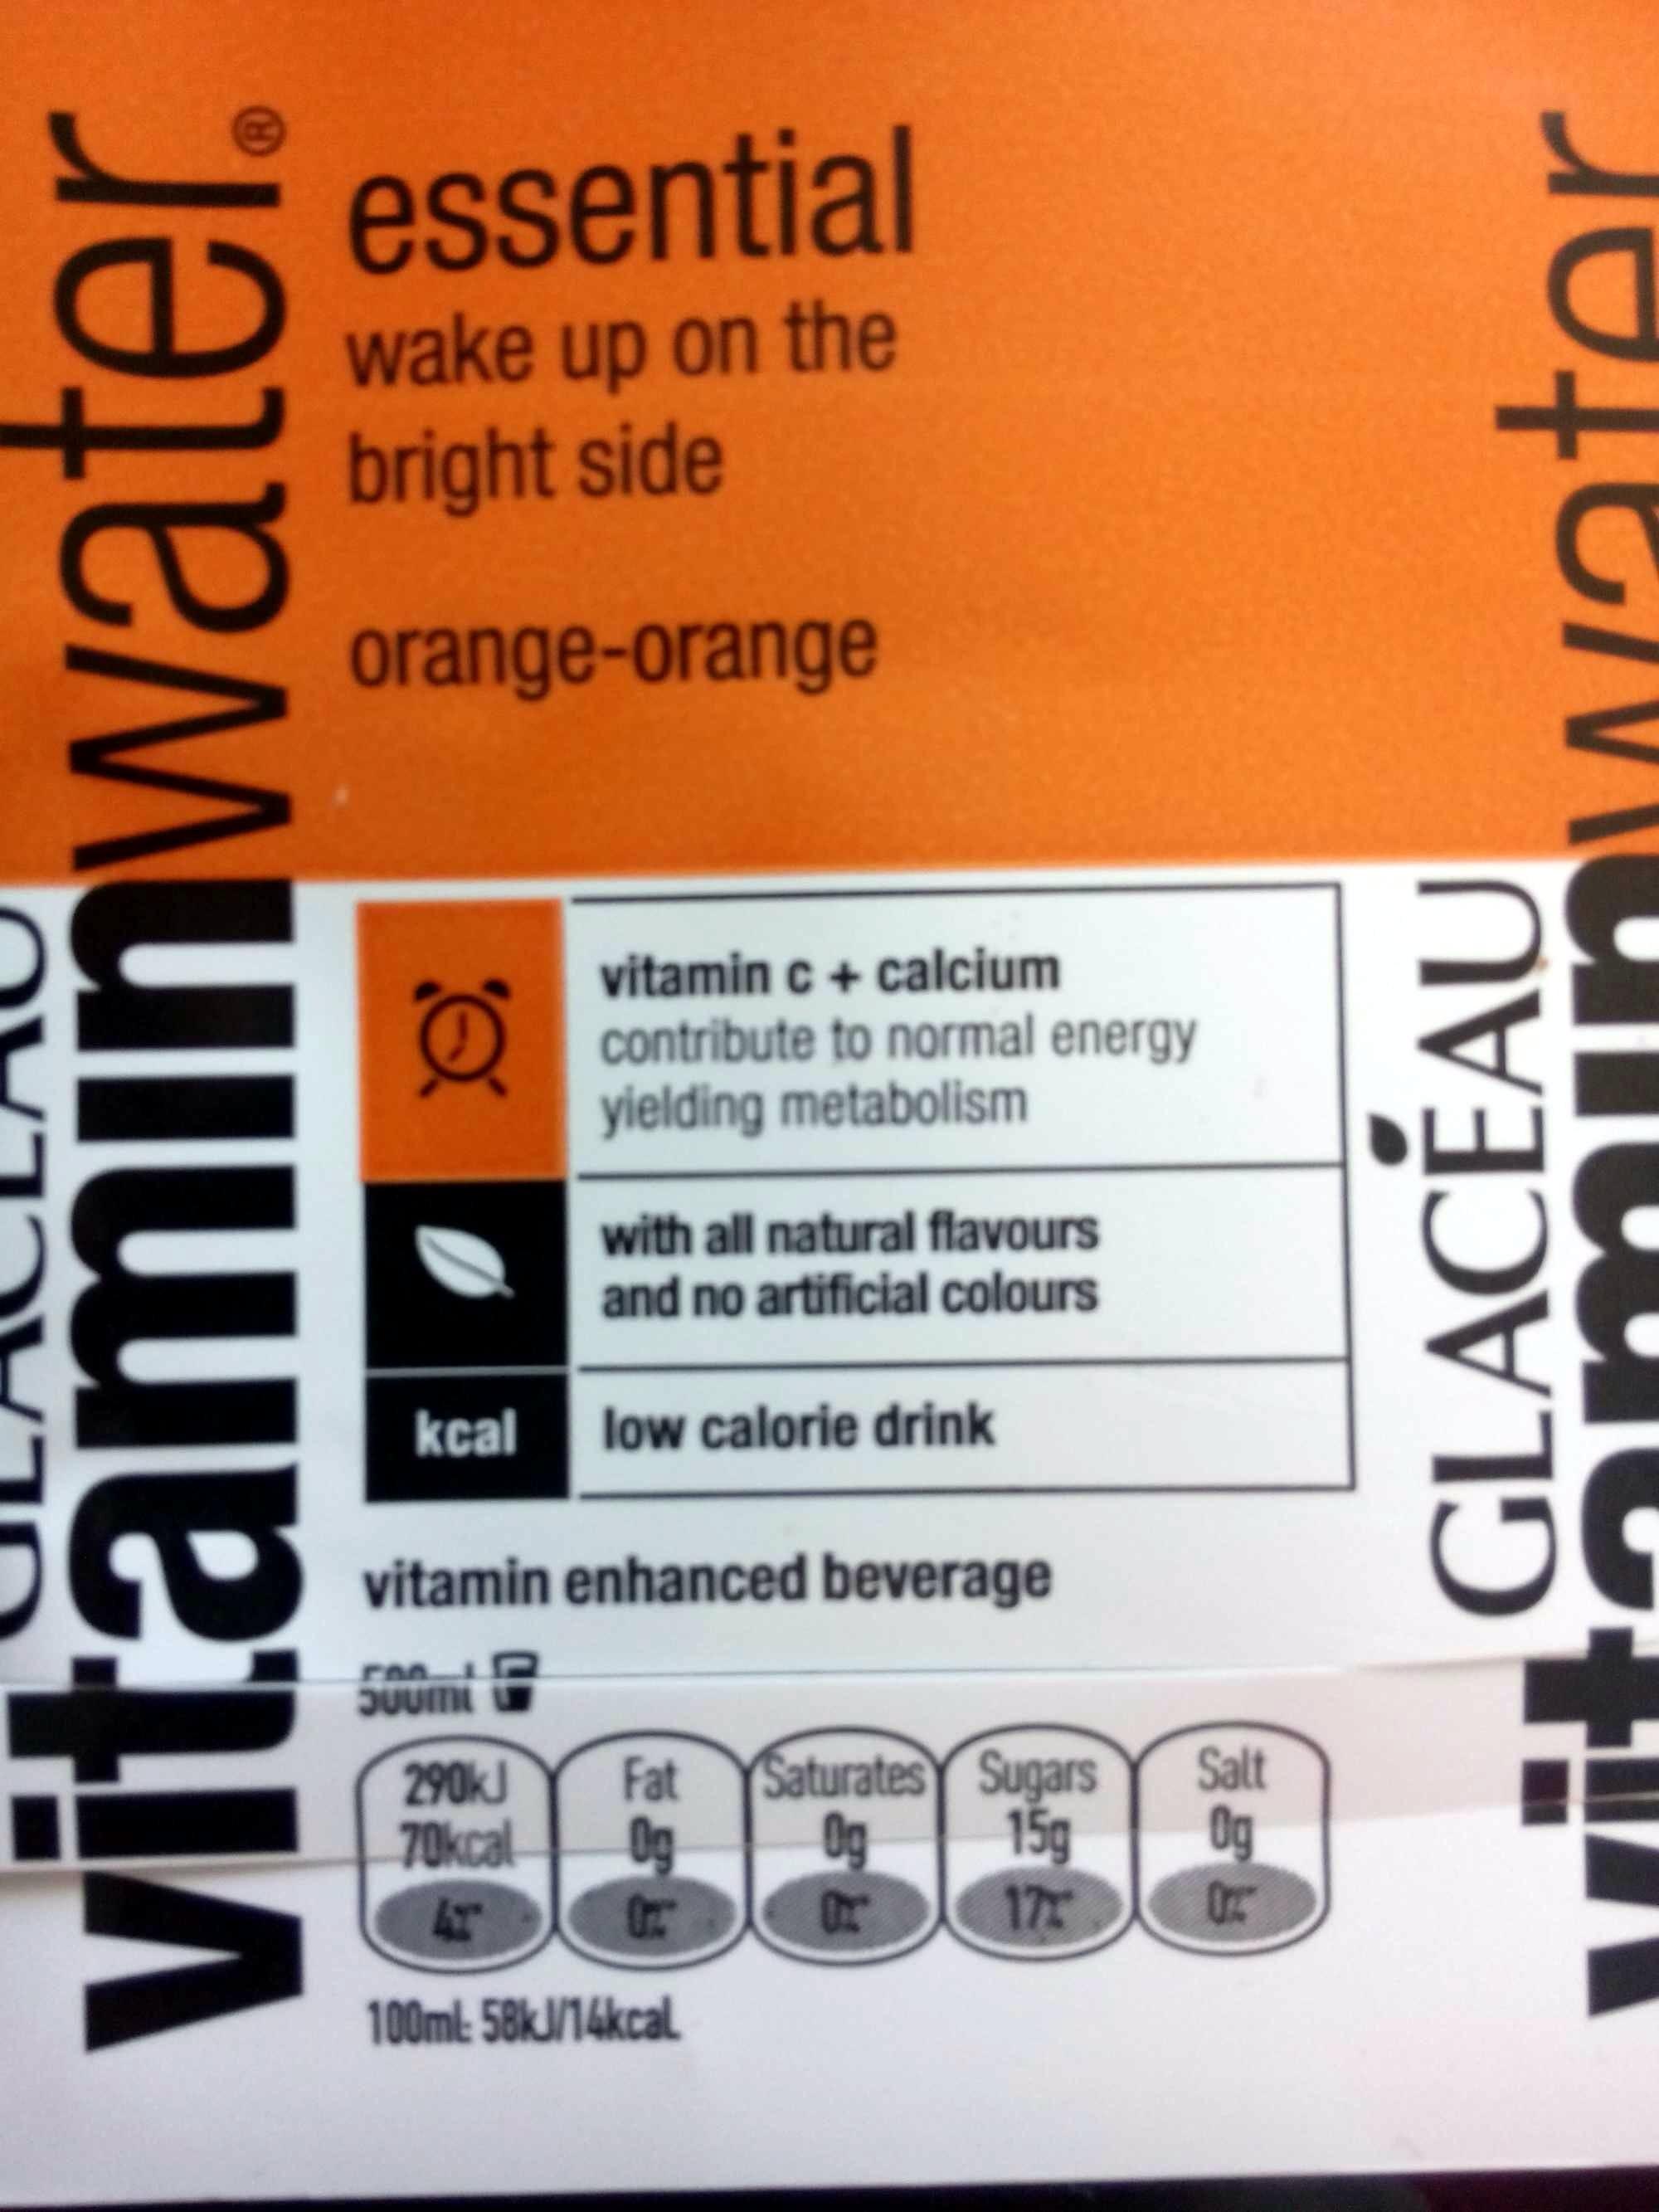 vitamin water essential orange-orange - 500 ml